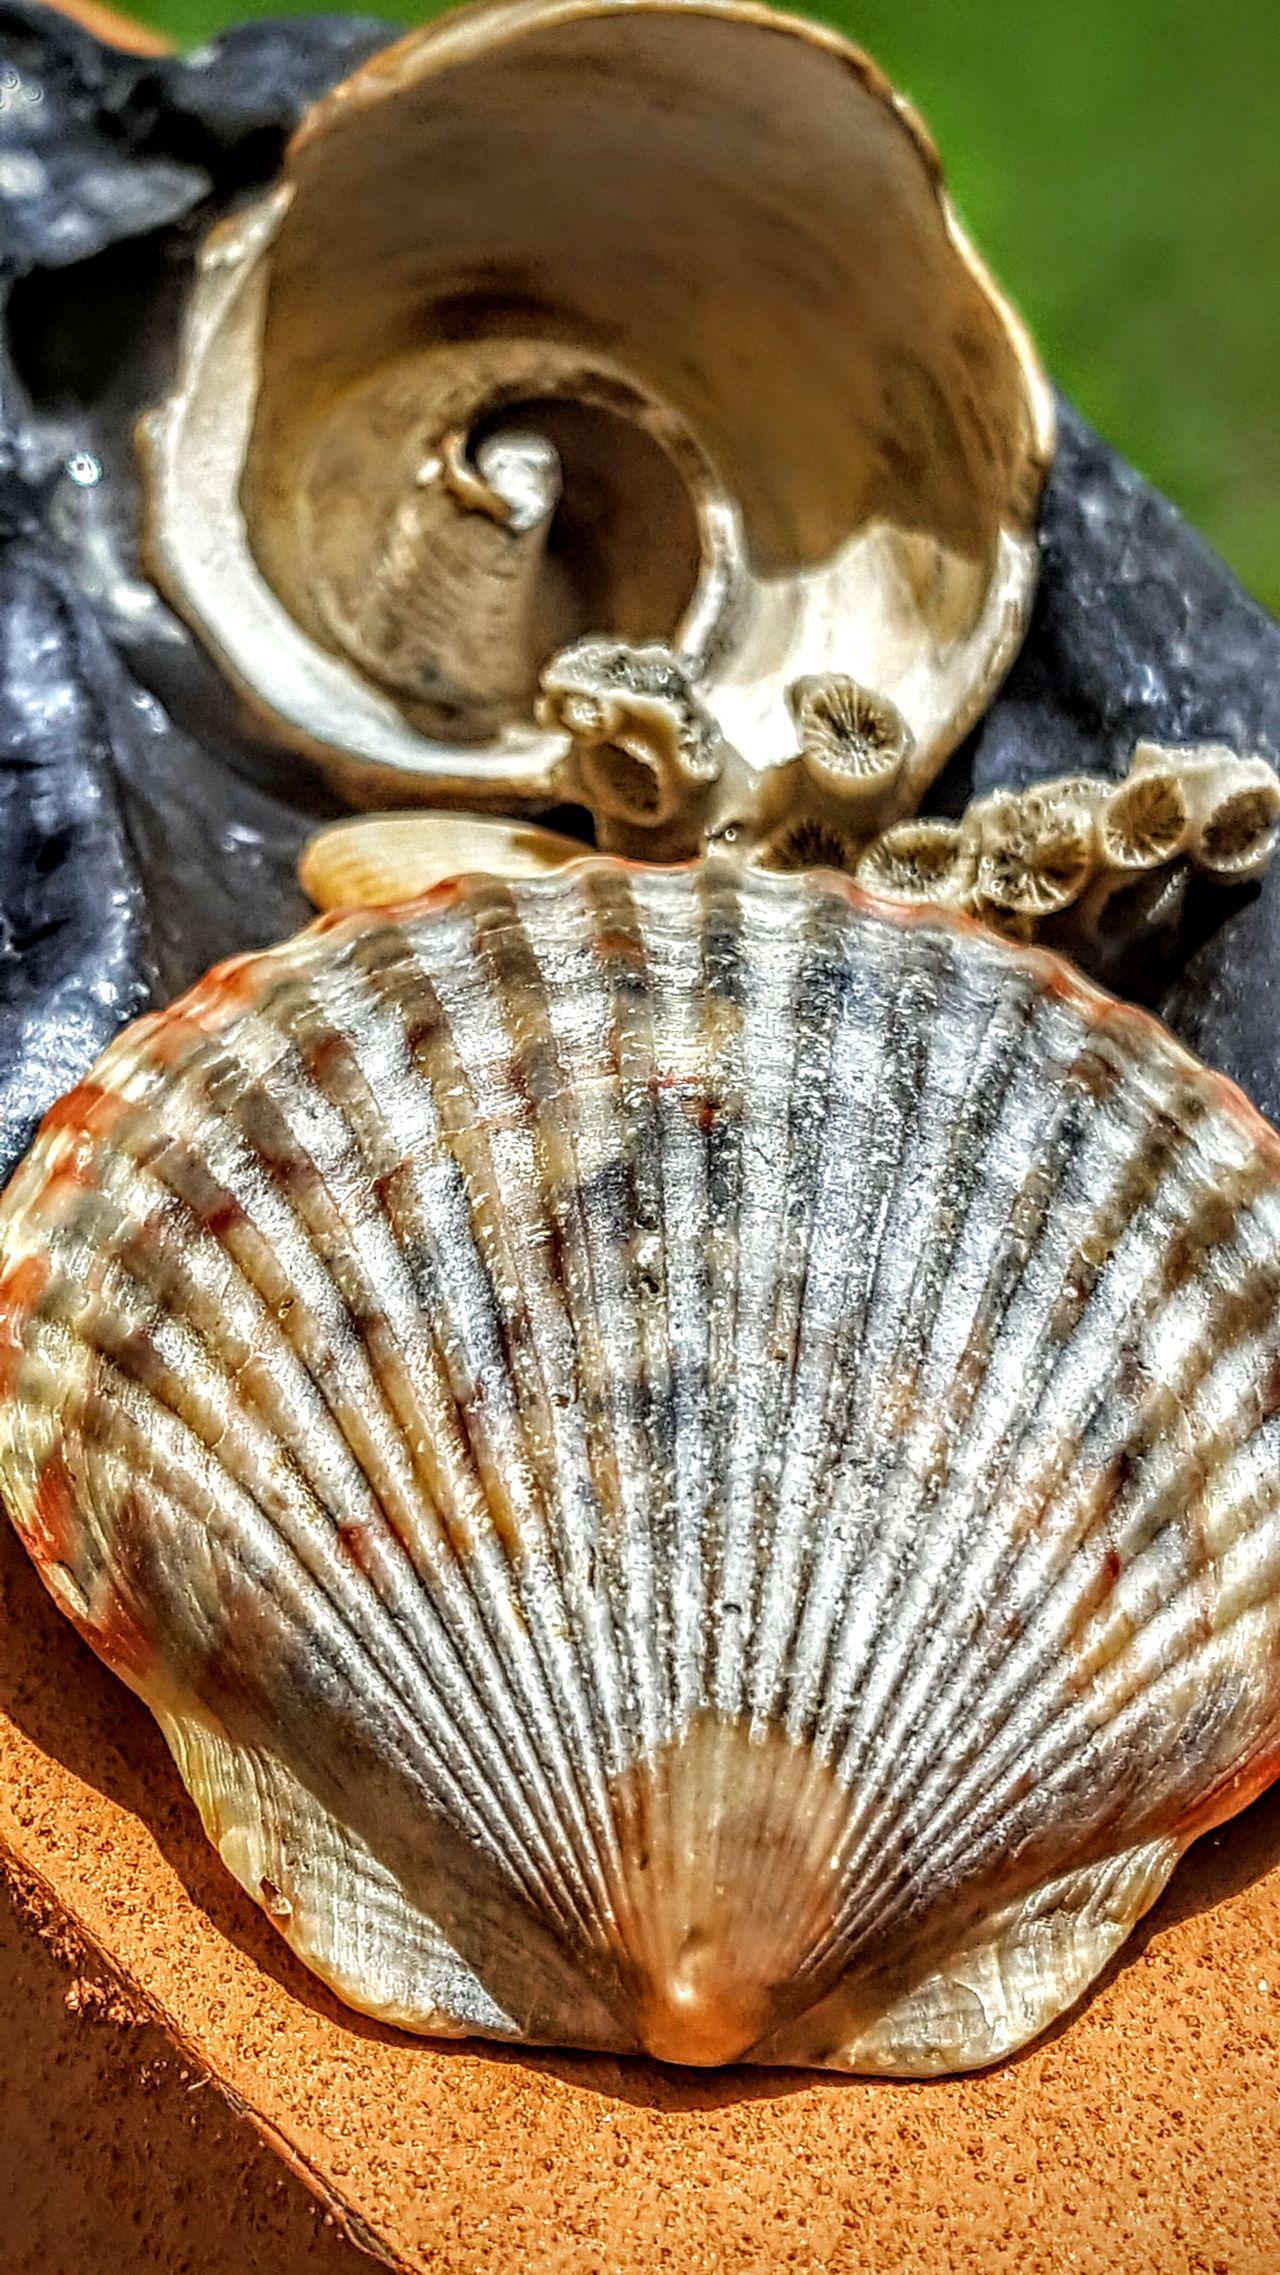 Seashells/dried Corals seashell Seashells Seashell Collection seashell Seashell Art Seashellart Seashell❤ Seashell Hunt